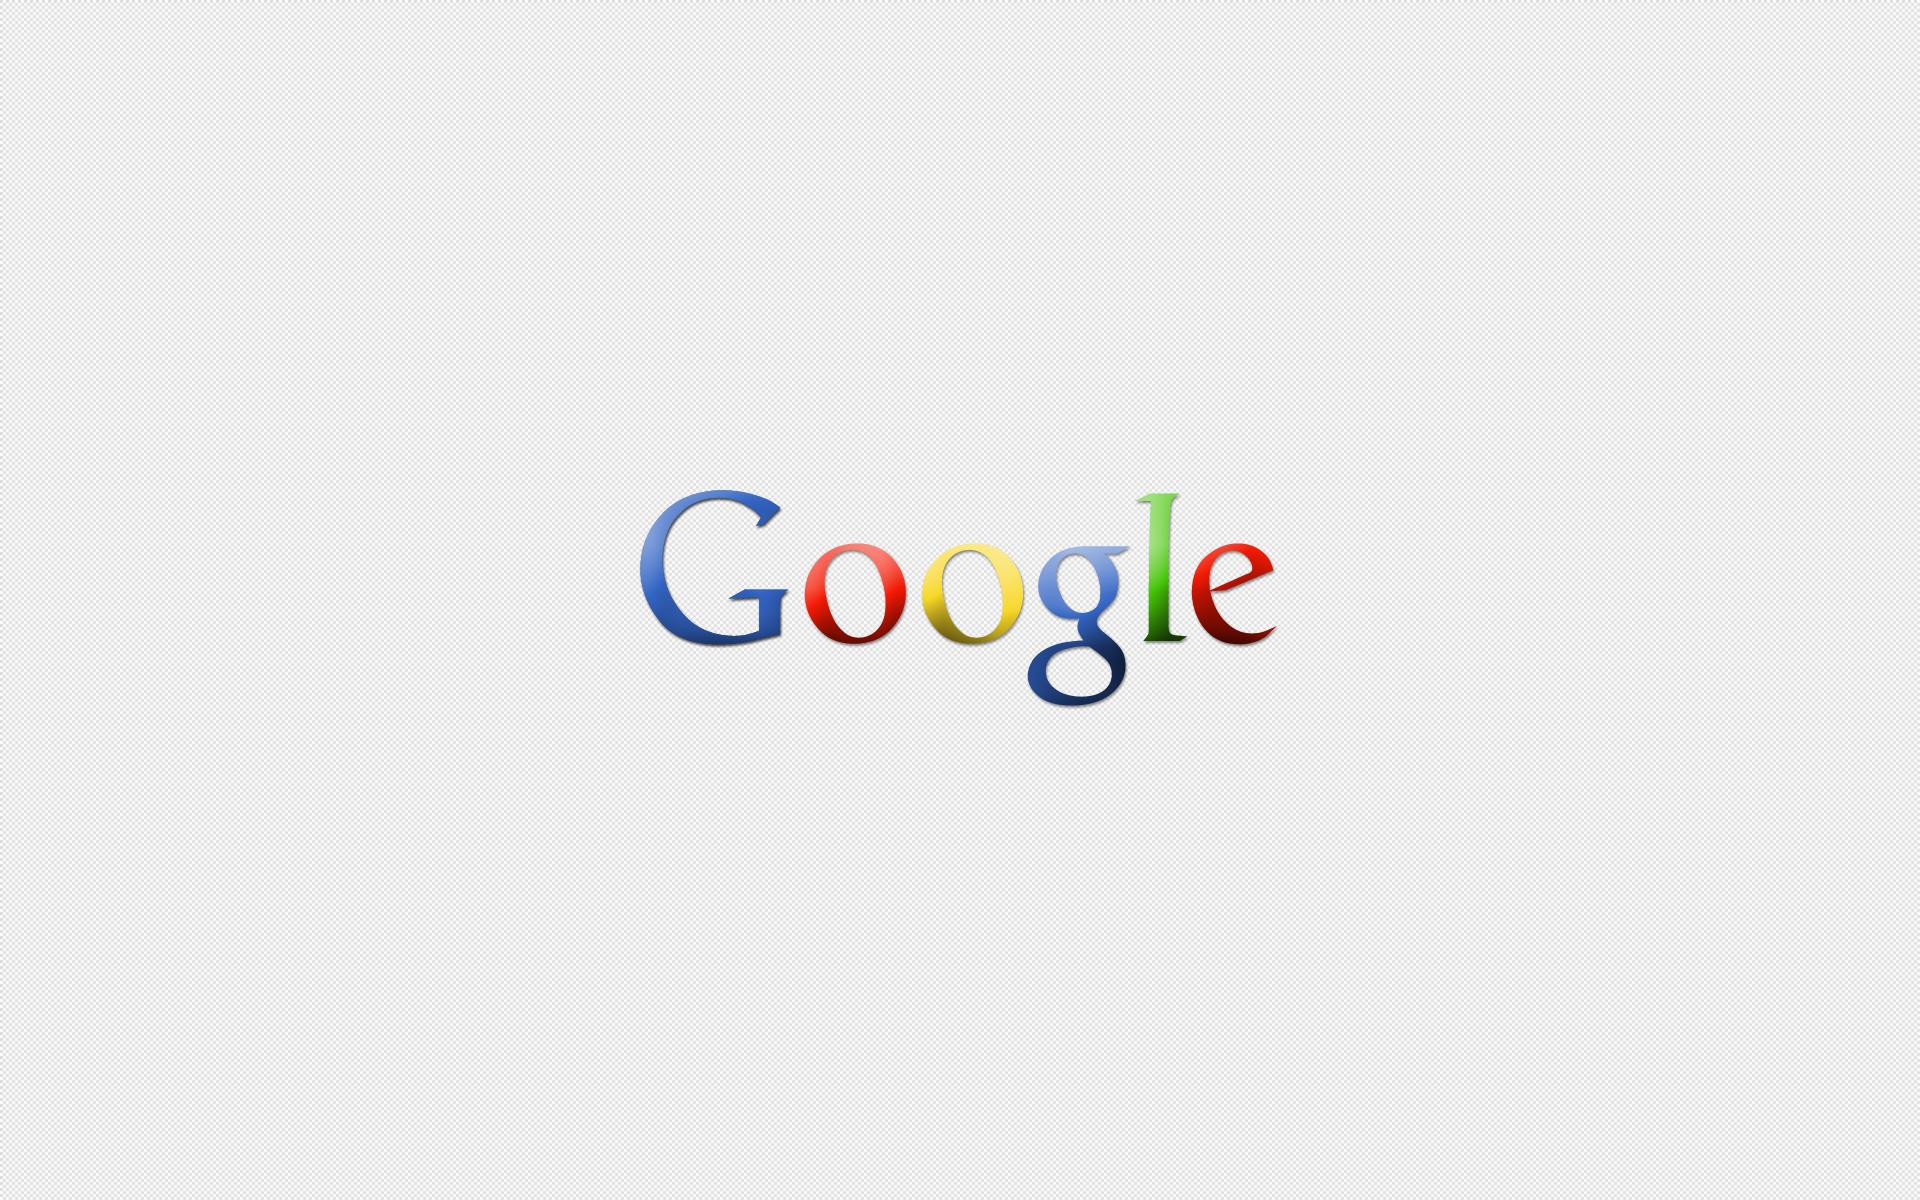 Google_Wallpaper_by_Rahul964 (1)